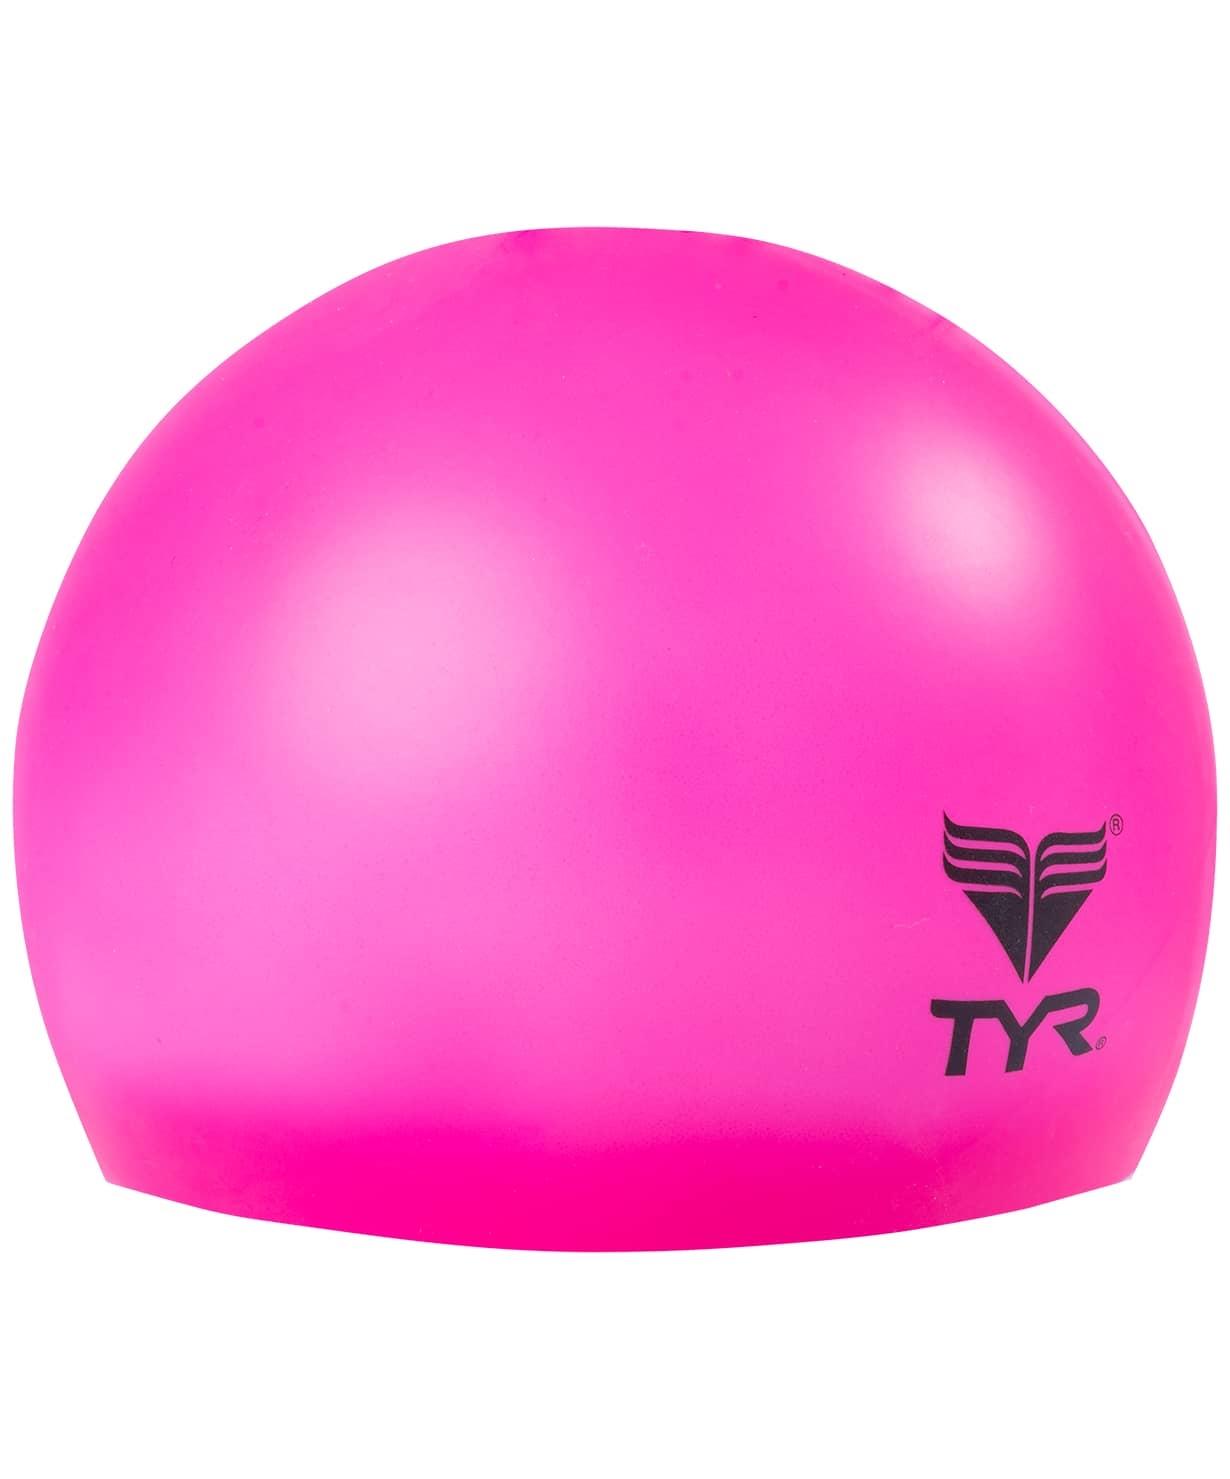 Шапочка для плавания Wrinkle Free Junior Silicone Cap, силикон, LCSJR/693, розовый